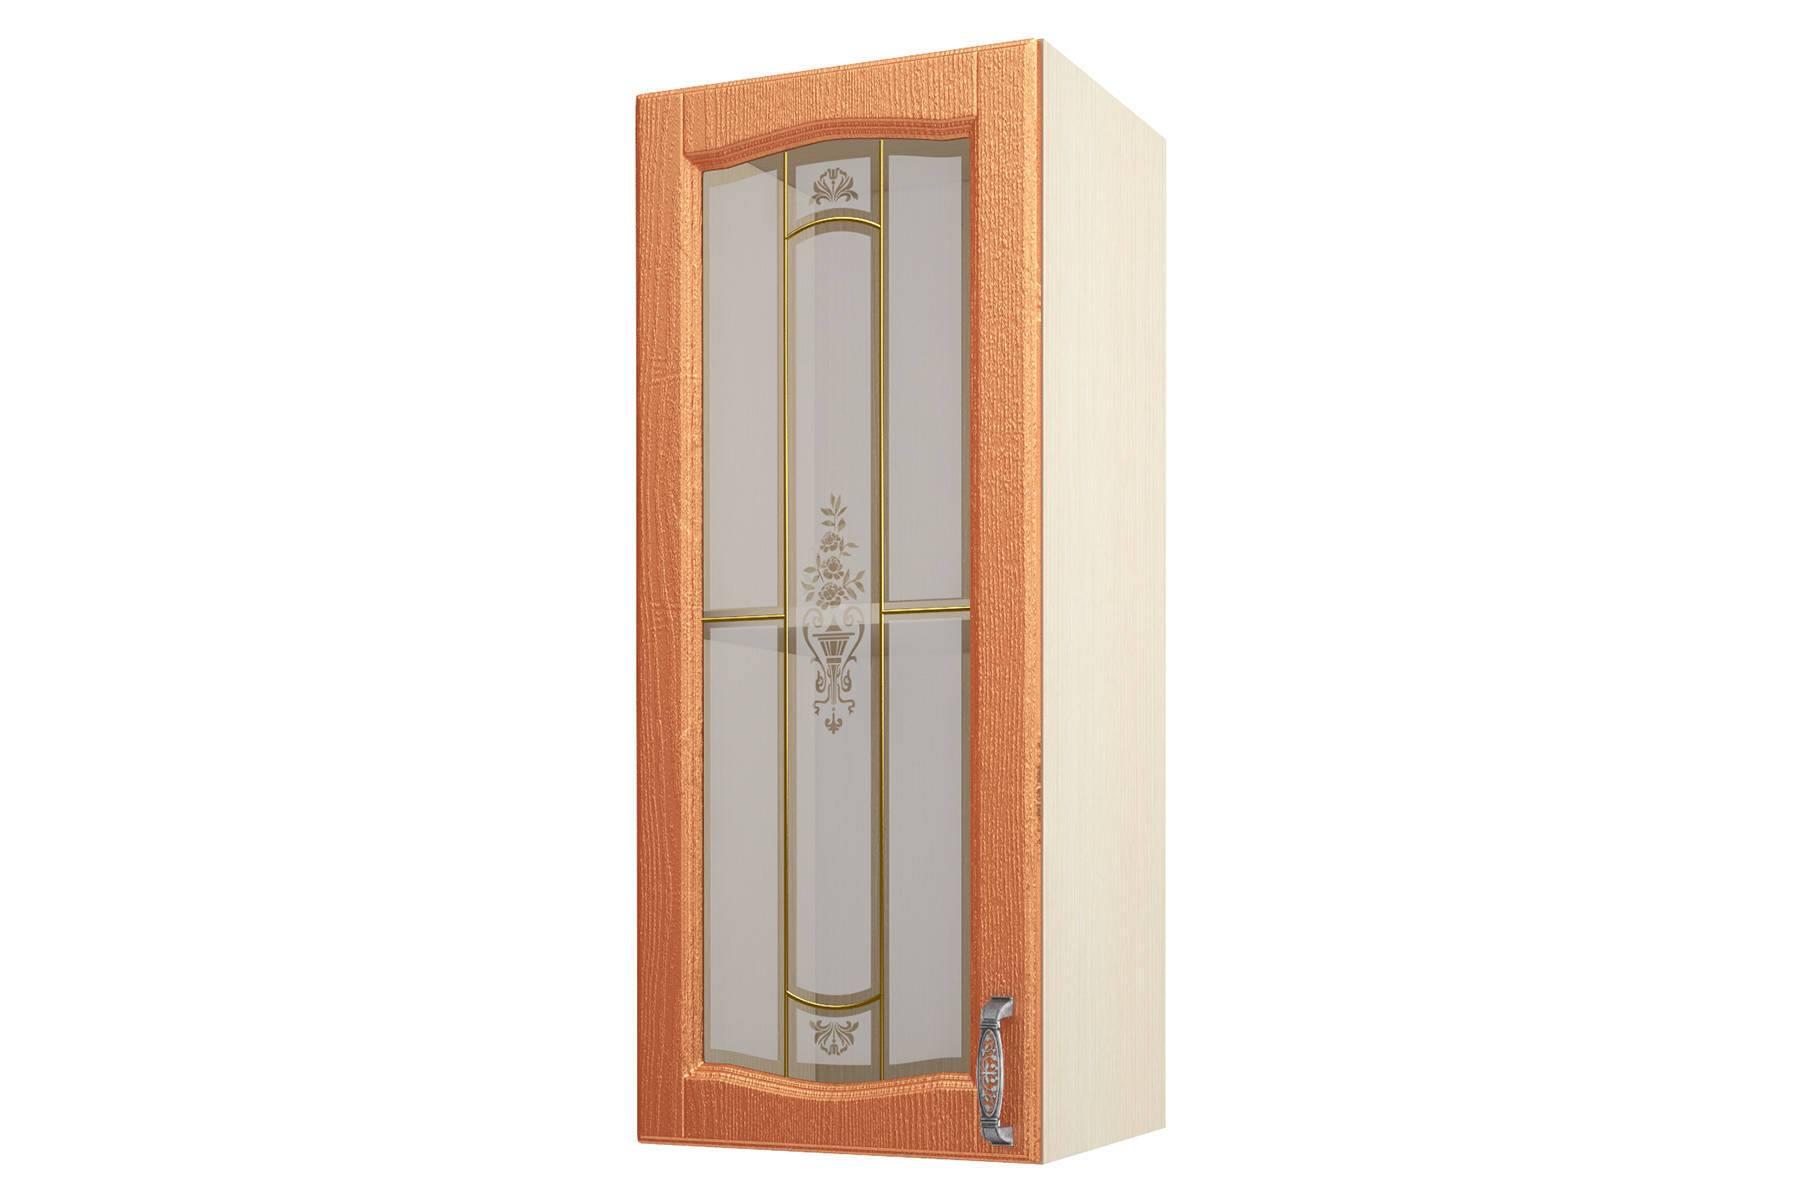 Равенна ART Шкаф-витрина 40, (Н-96), 1 дверь равенна art шкаф навесной 40 н 96 1 дверь